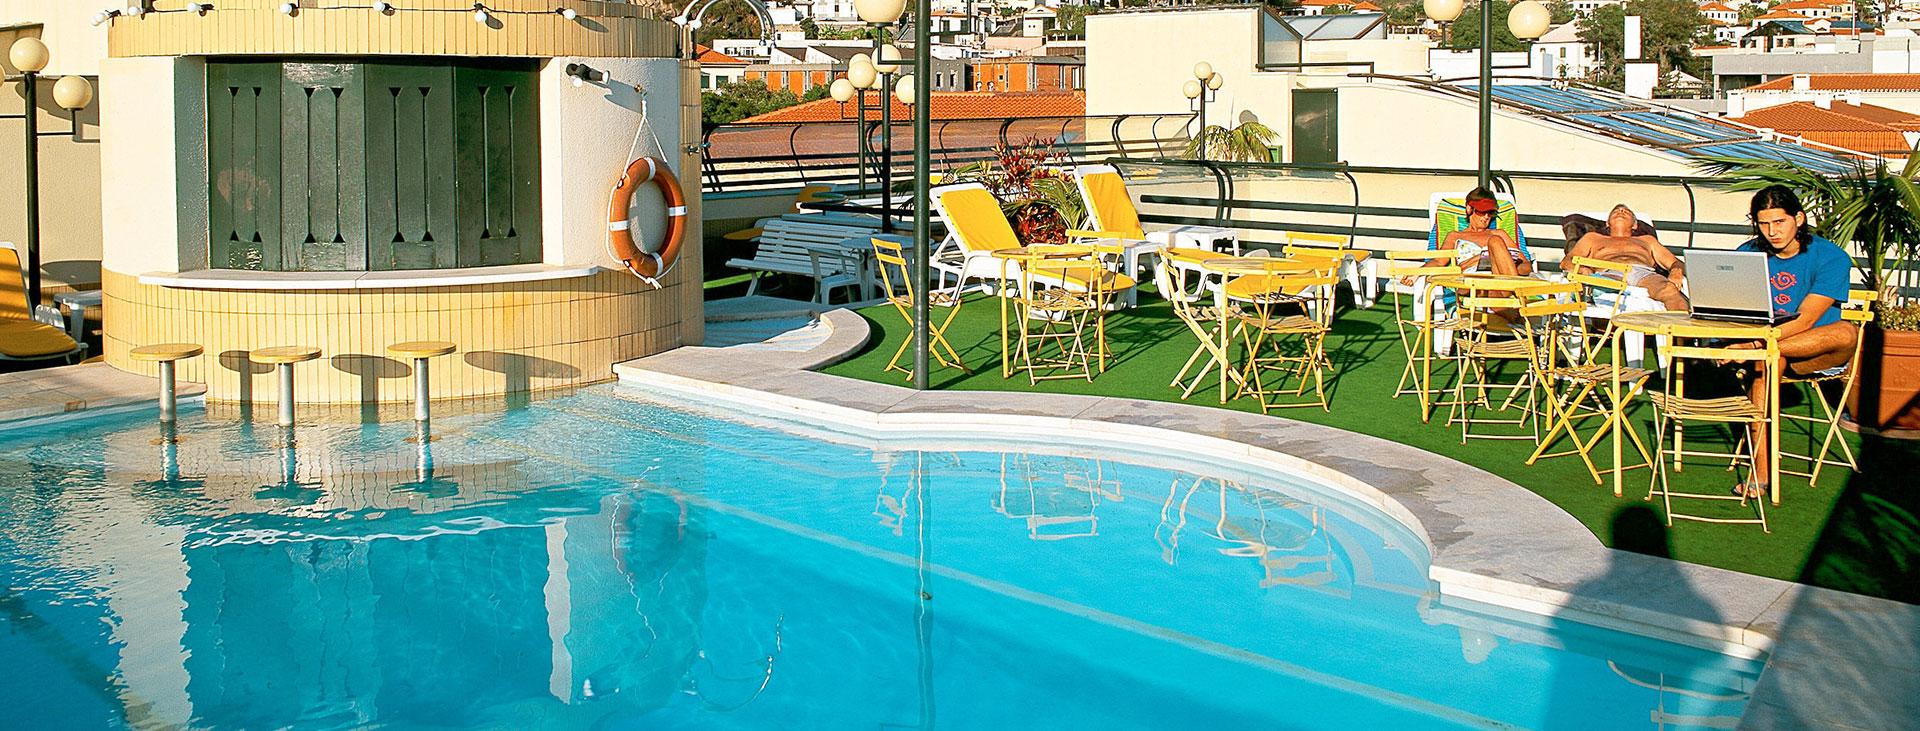 Windsor Hotel, Funchal, Madeira, Portugal